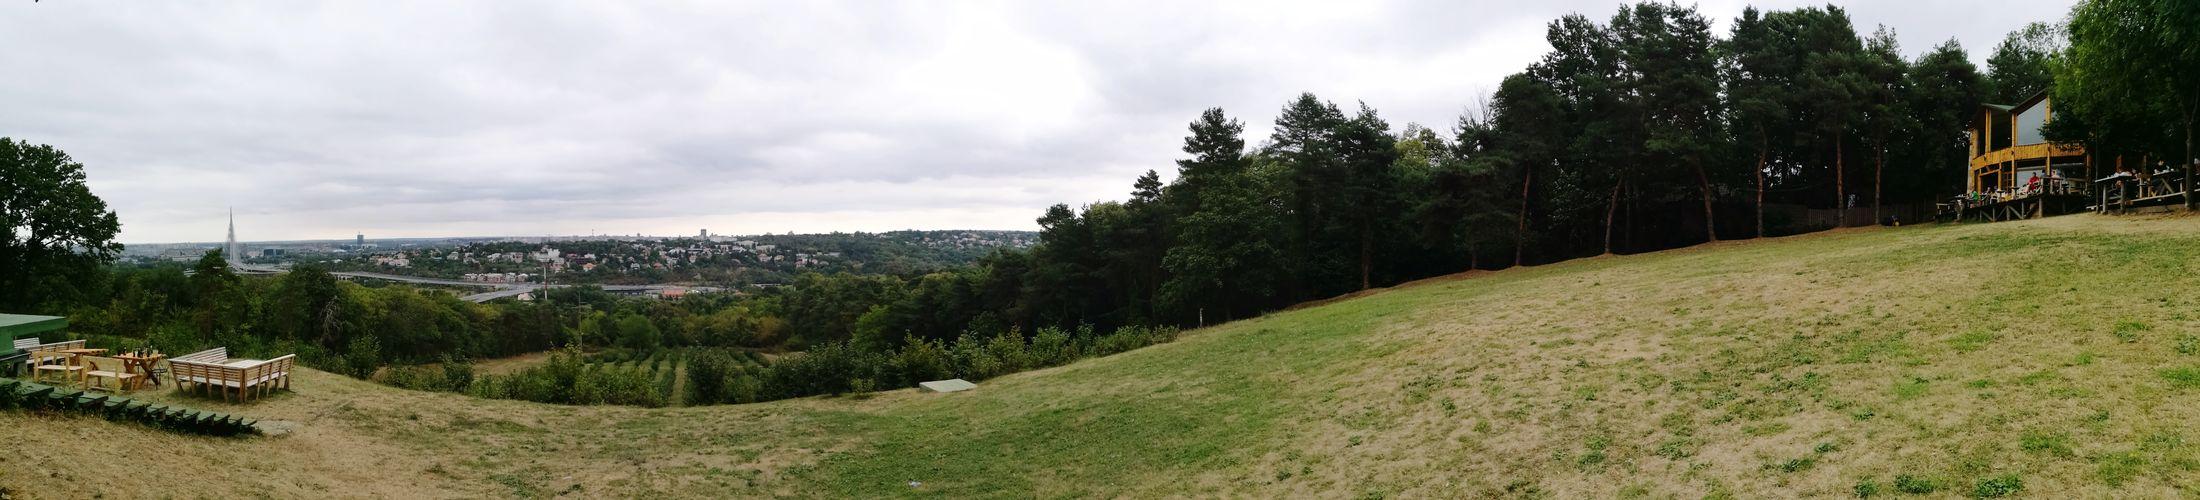 Cloud - Sky No People Landscape Outdoors Nature Kosutnjak Pogled View